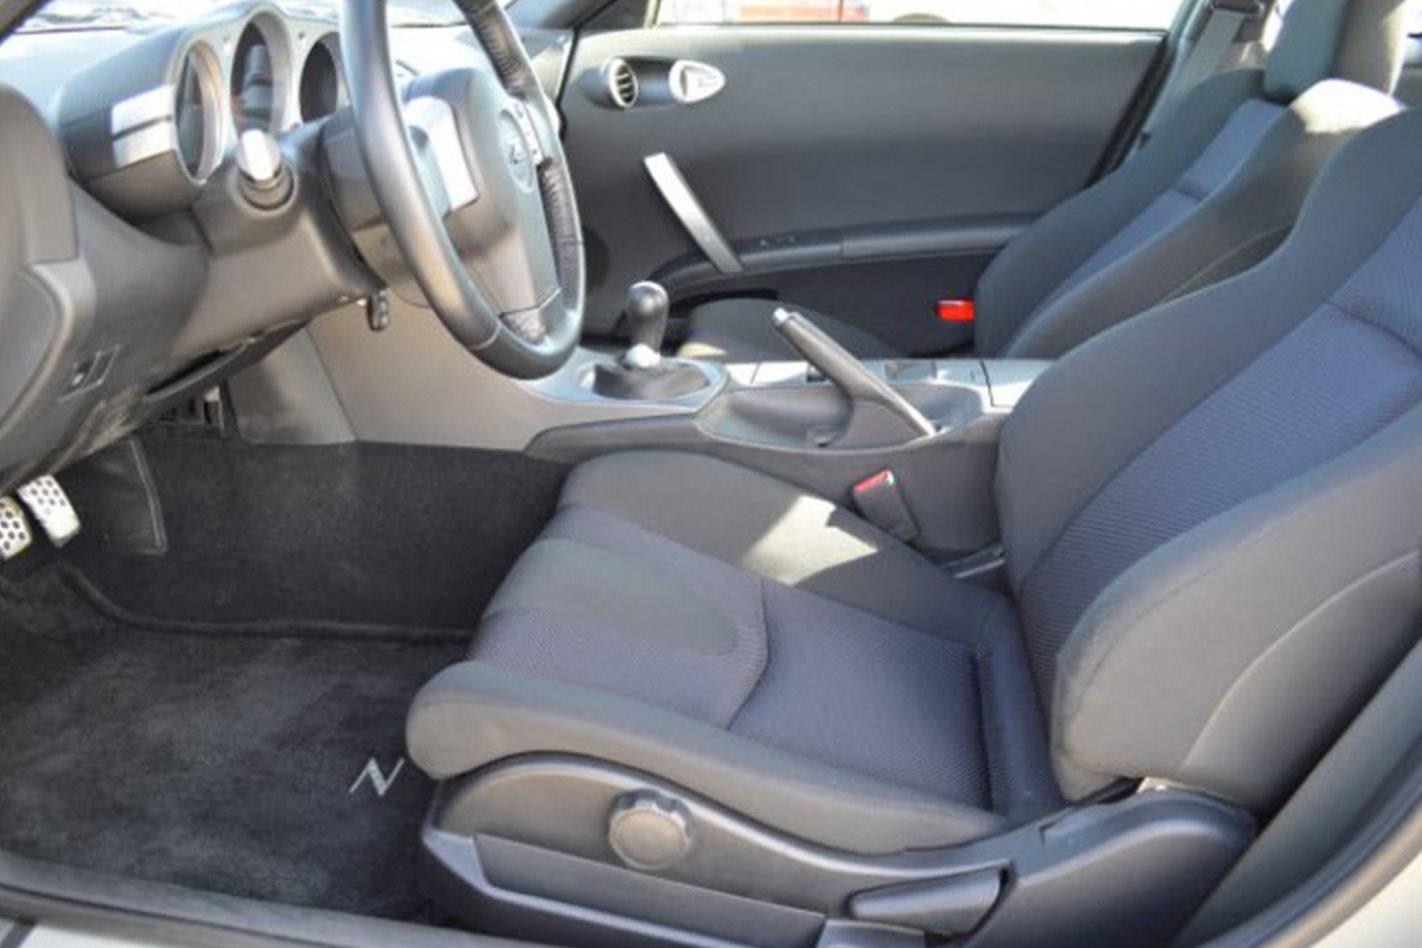 2003 nissan 350z interior. 2003 nissan 350z interior